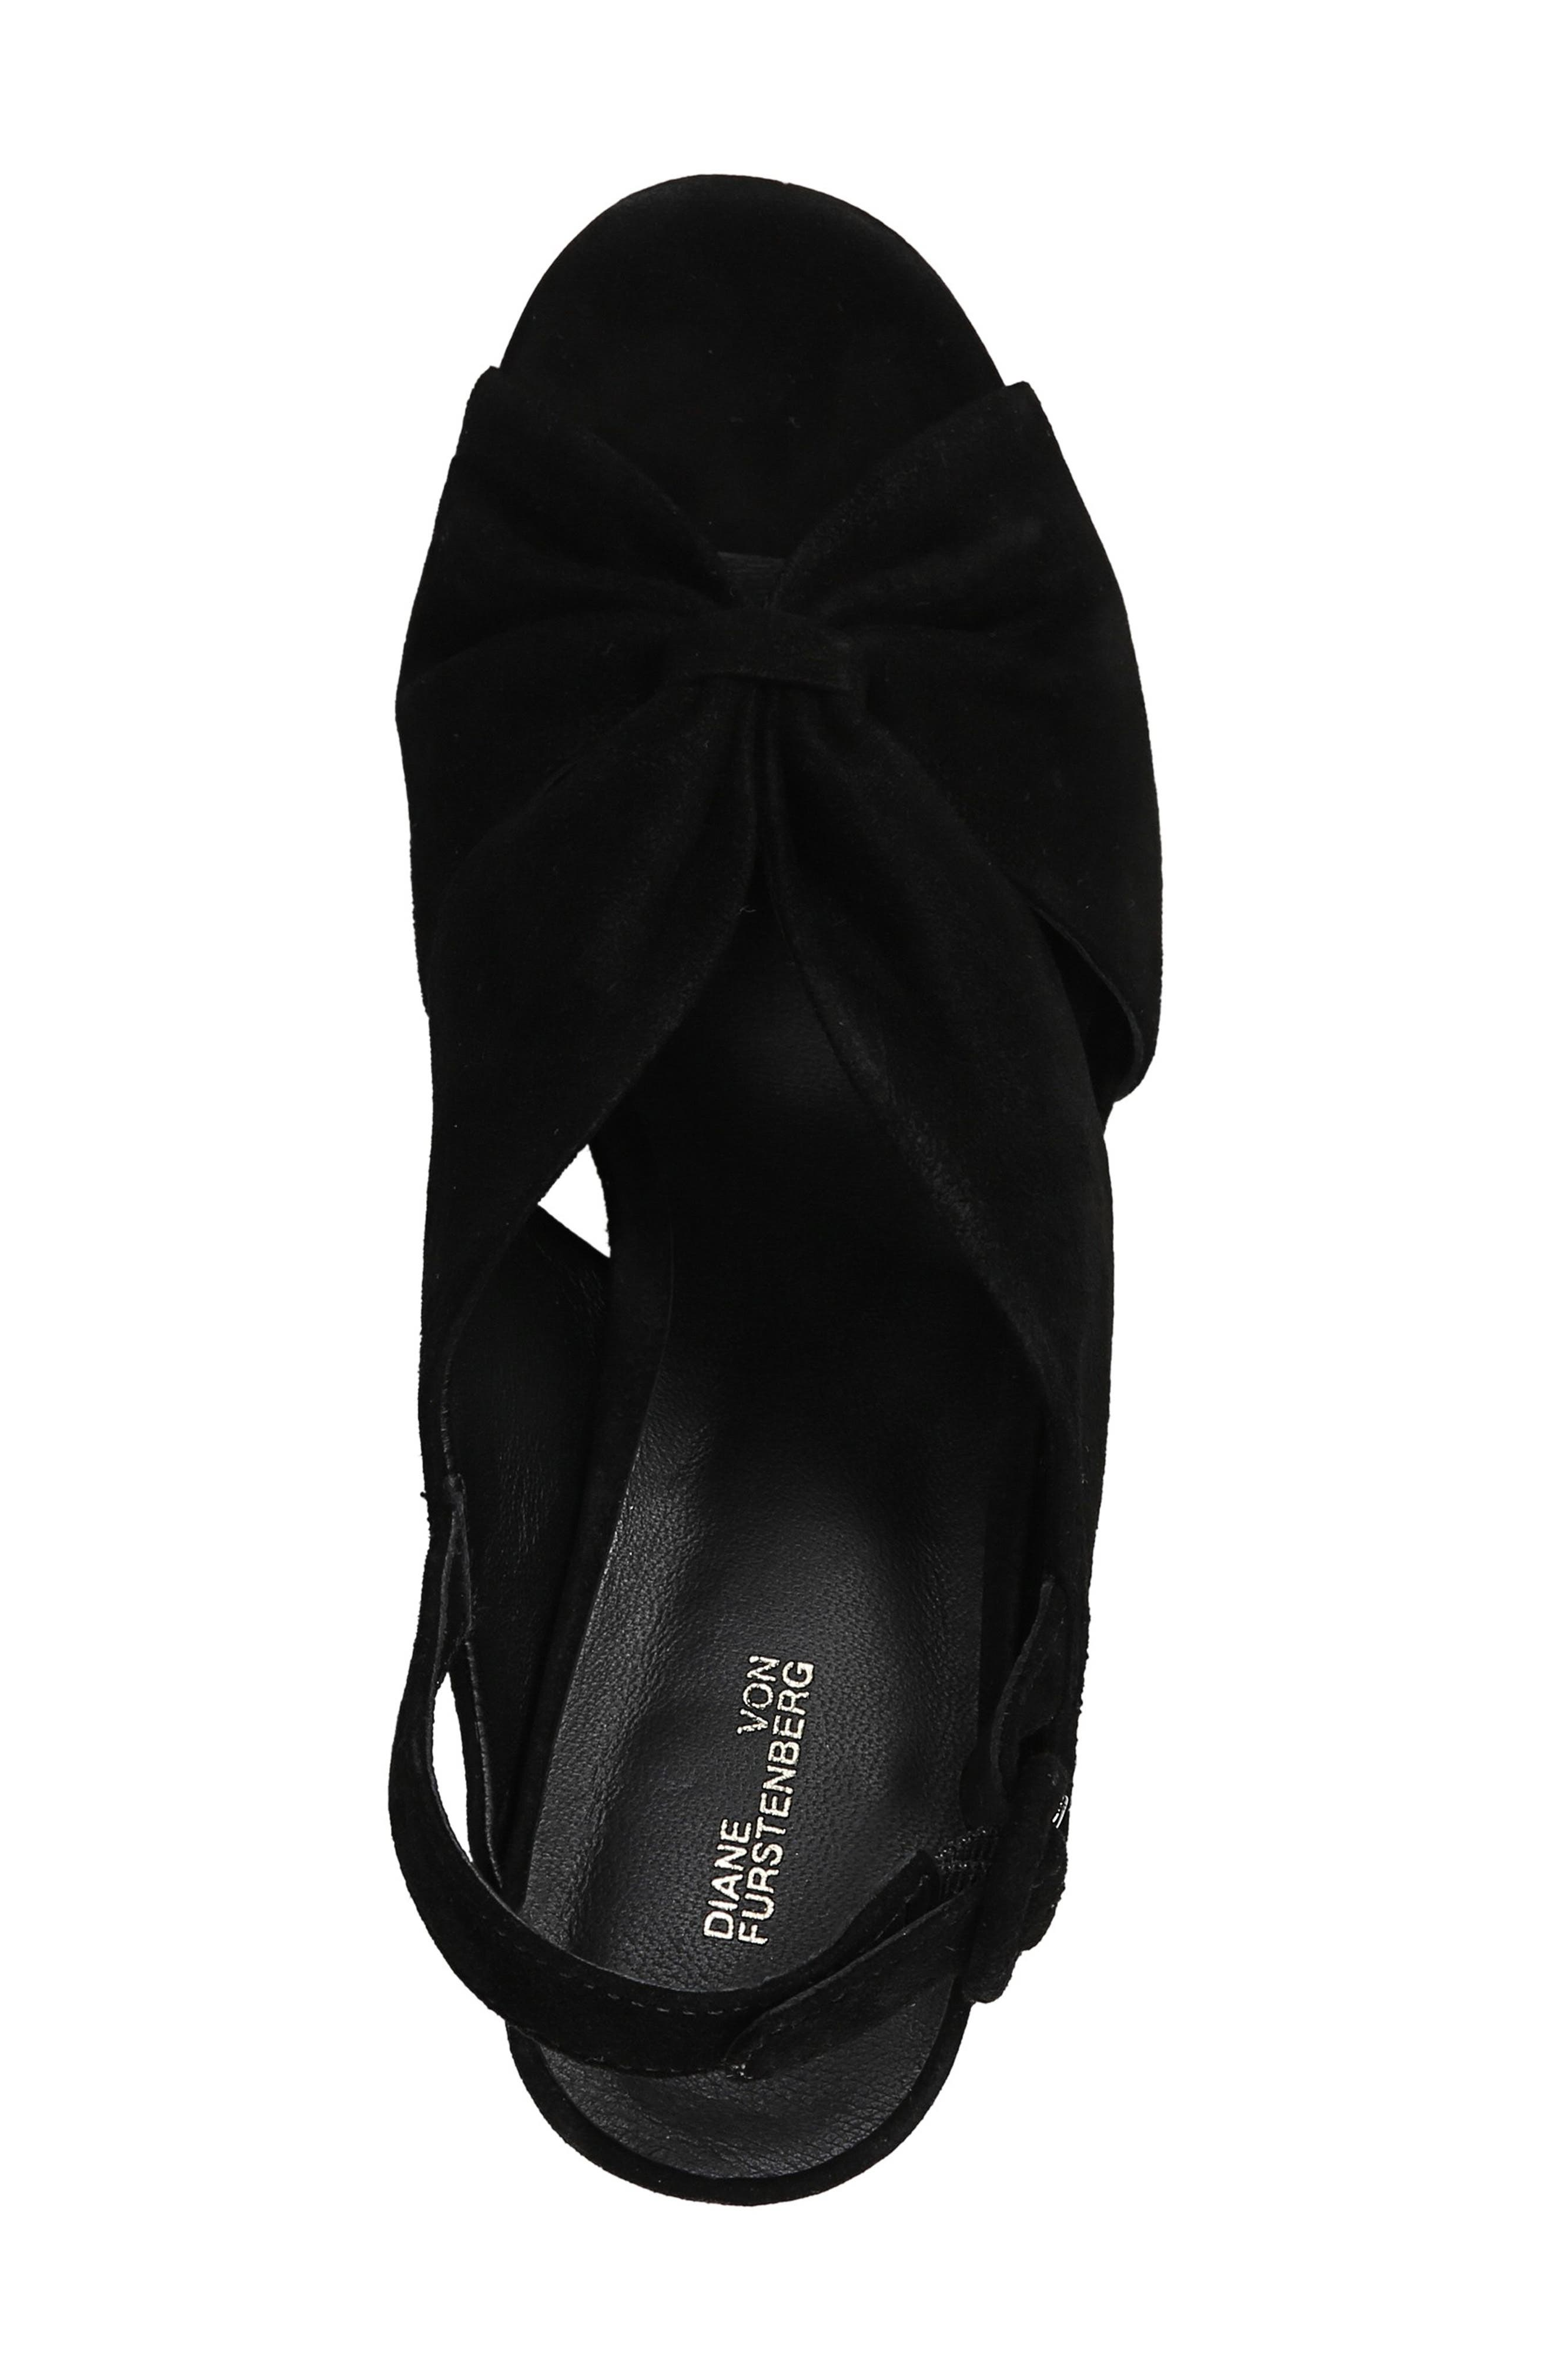 DIANE VON FURSTENBERG, Heidi Platform Sandal, Alternate thumbnail 5, color, BLACK